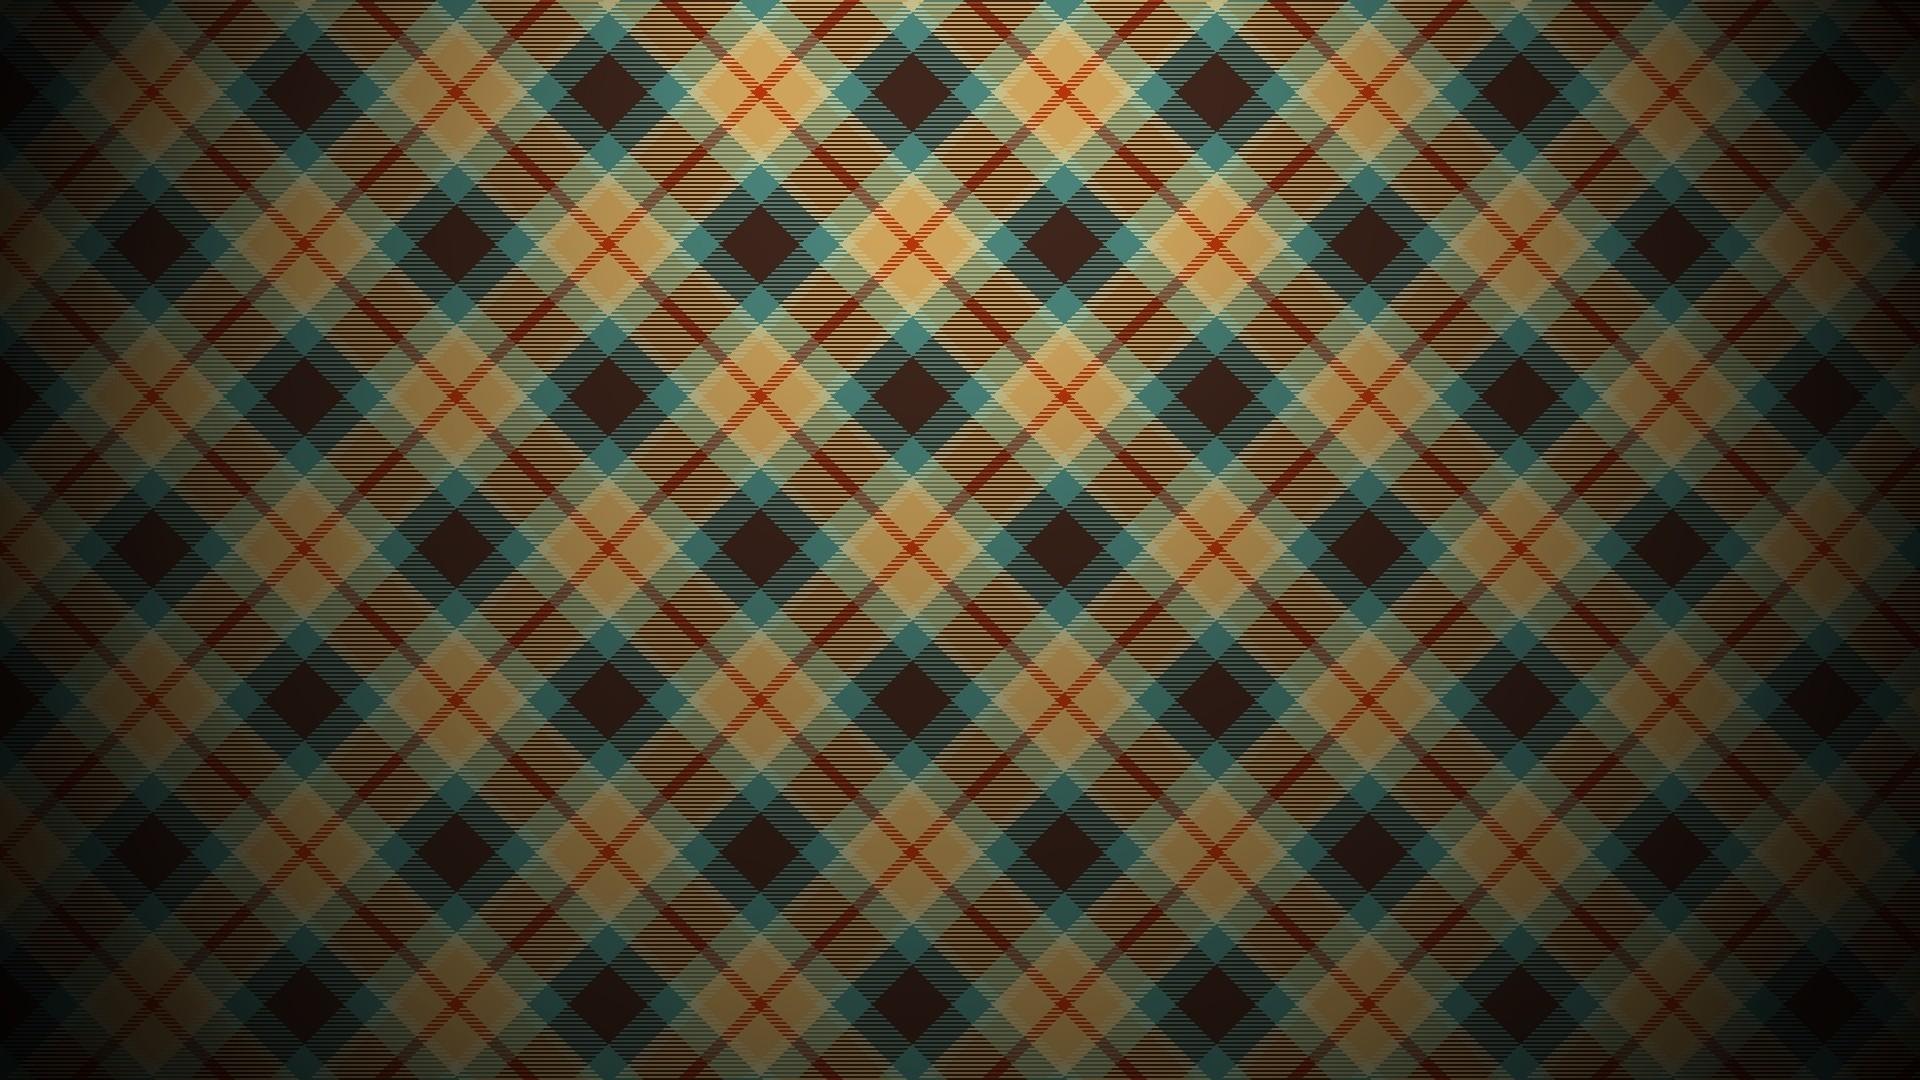 Checkered Image